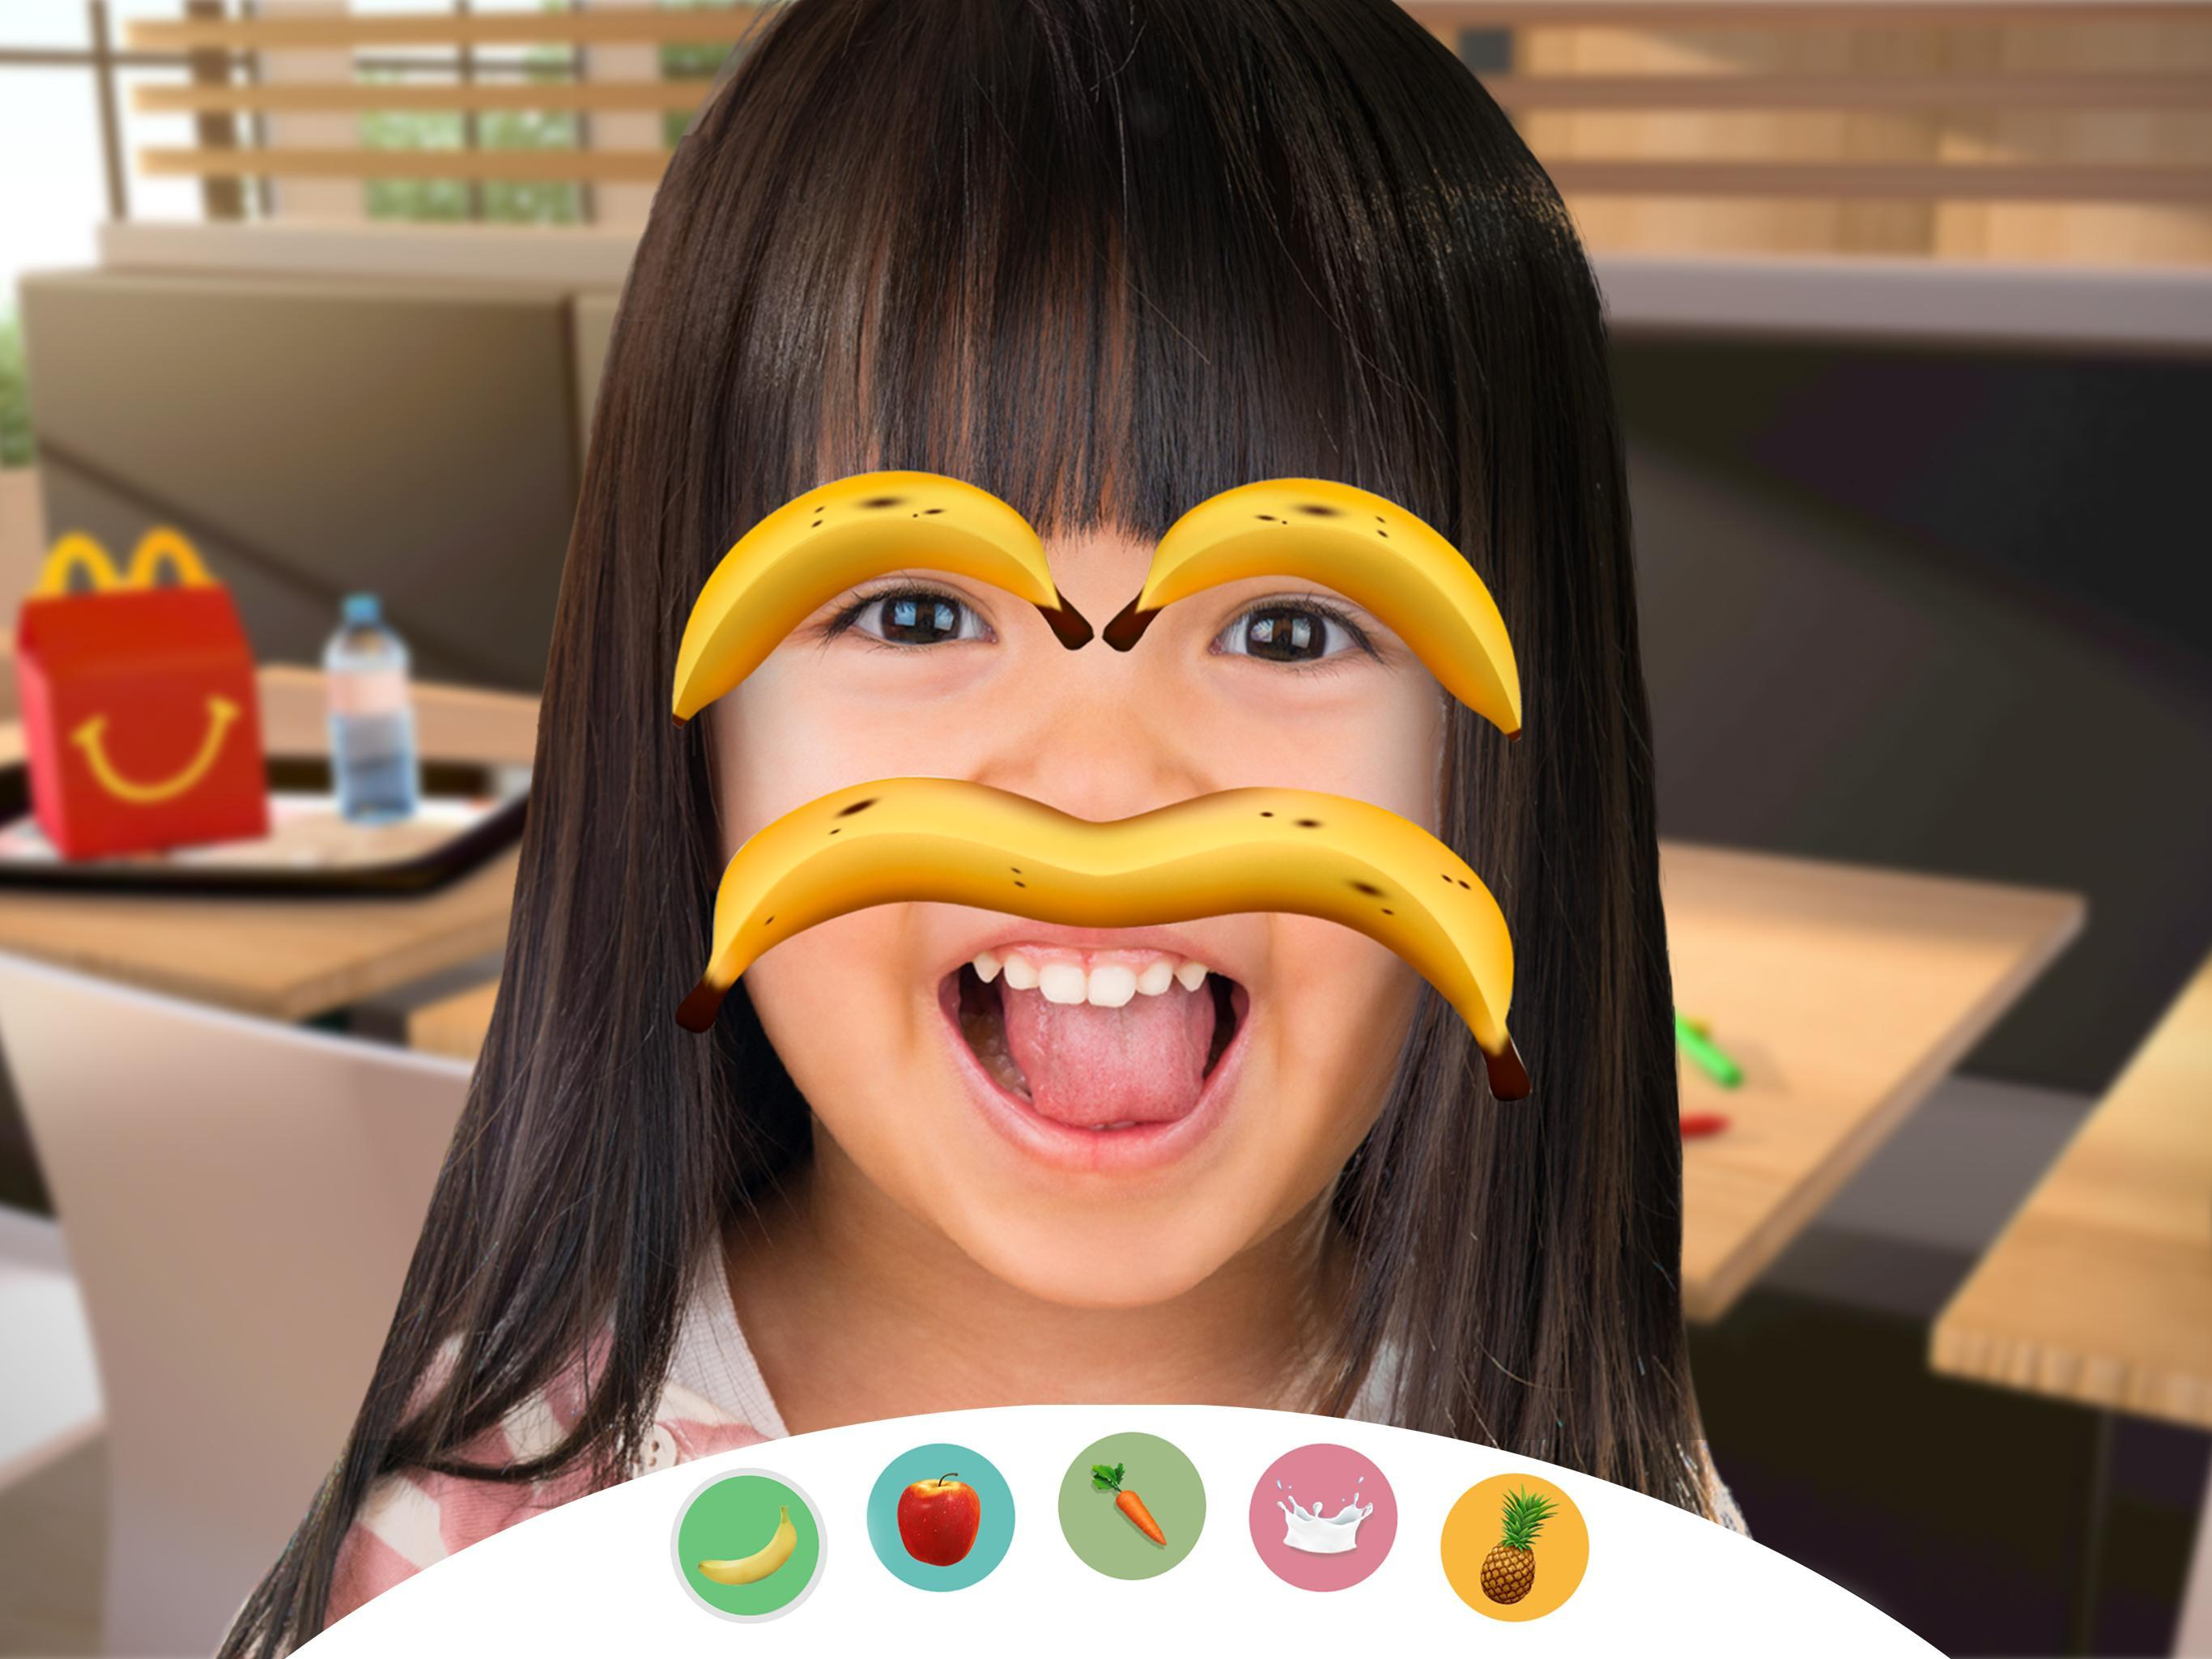 McDonald's Happy Meal App - MEA 9.5.0 Screenshot 19